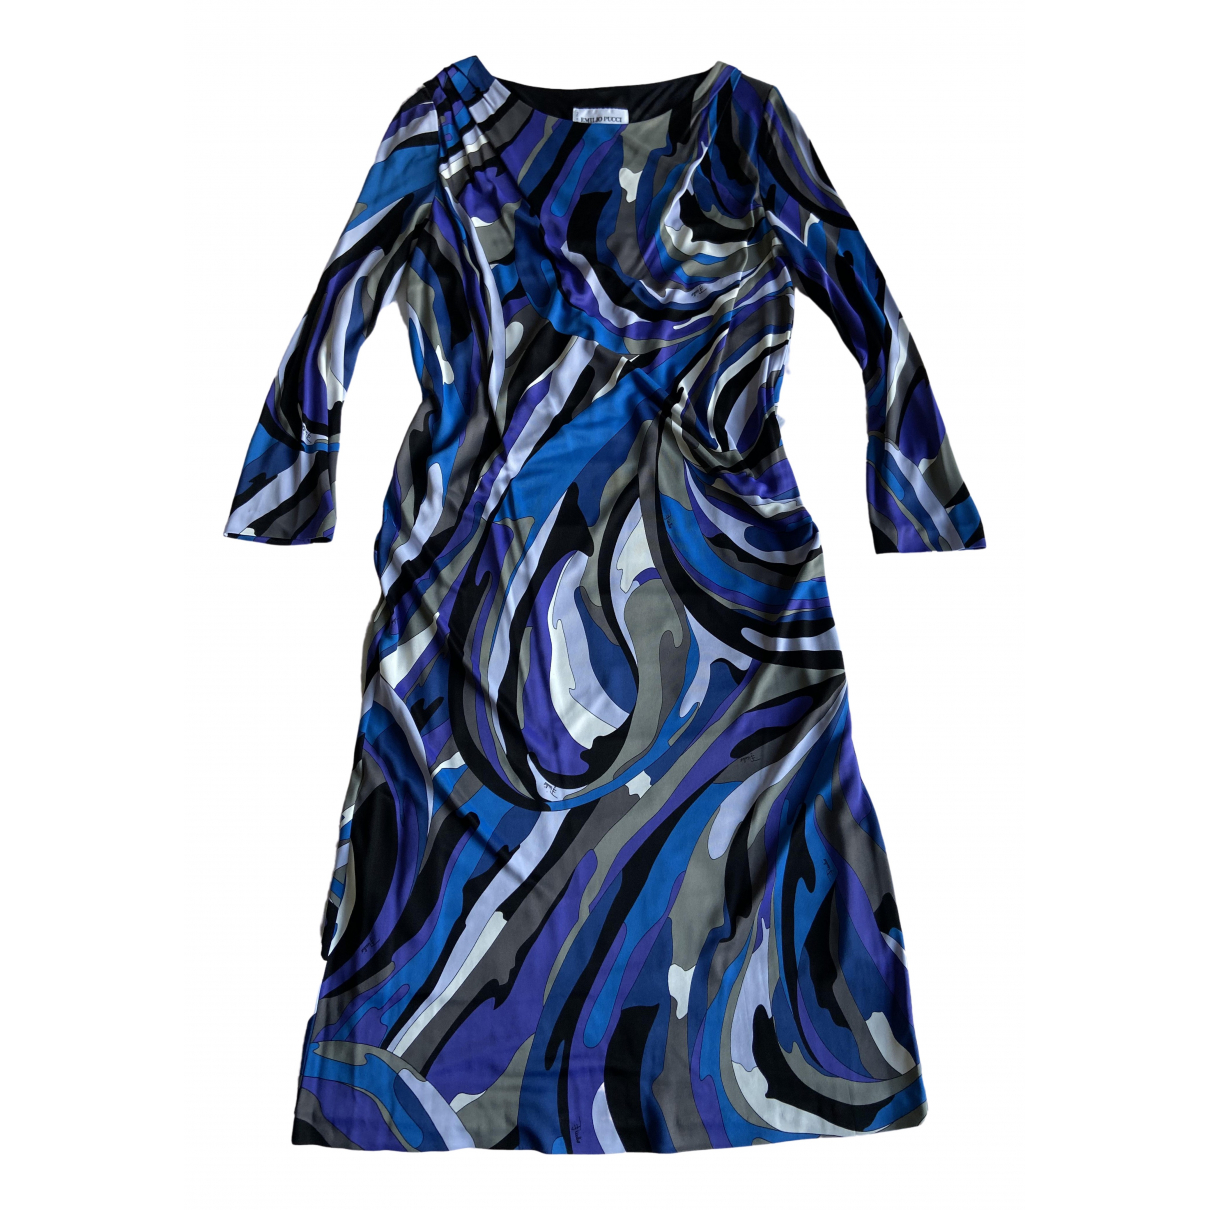 Emilio Pucci \N Kleid in  Blau Viskose